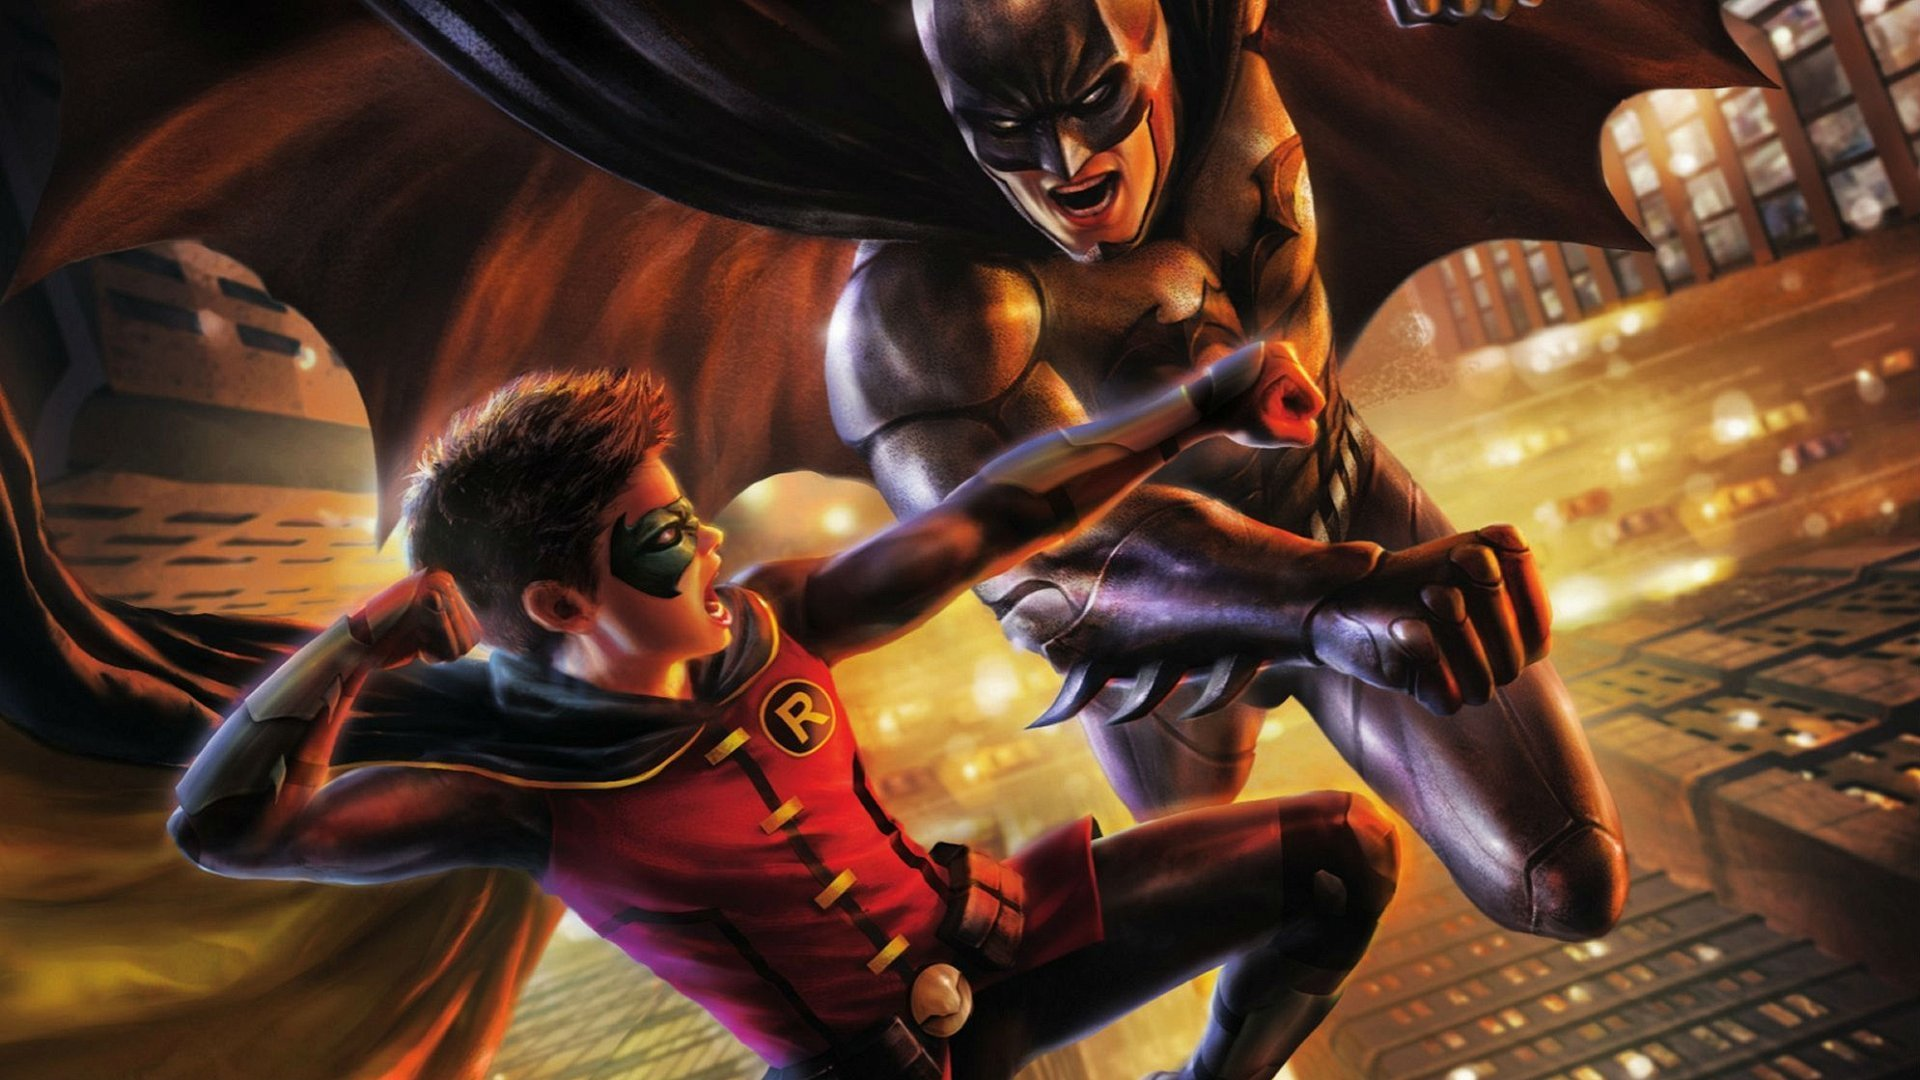 2 batman vs robin hd wallpapers backgrounds wallpaper abyss - Image de batman et robin ...